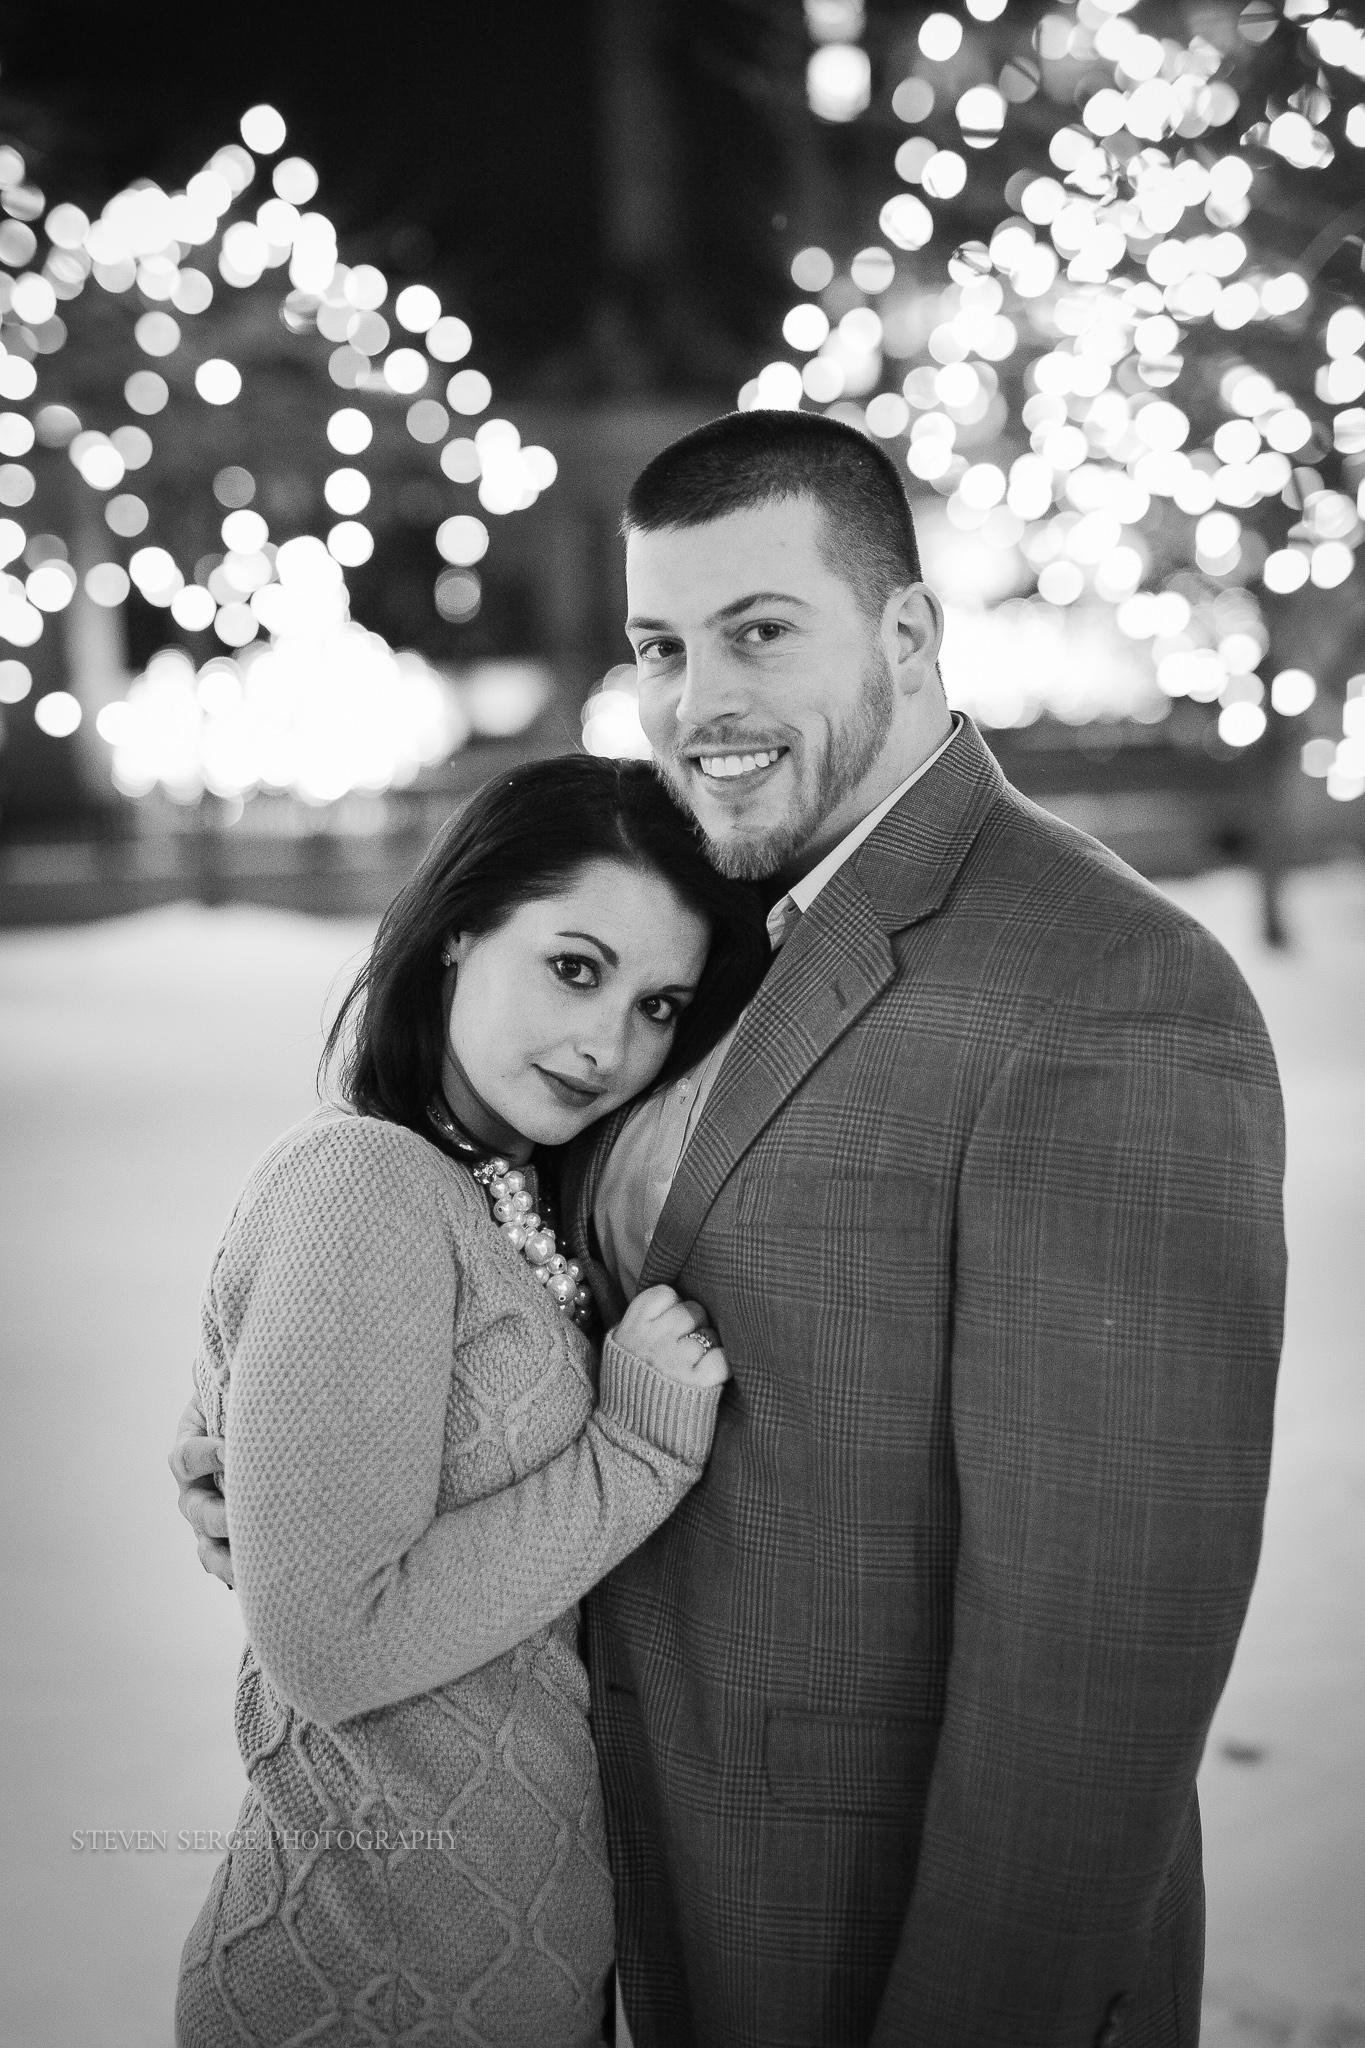 Lindsey-Cultural-Center-Scranton-Engagement-Wedding-Nepa-Photographer-Steamtown-Photography-8.jpg